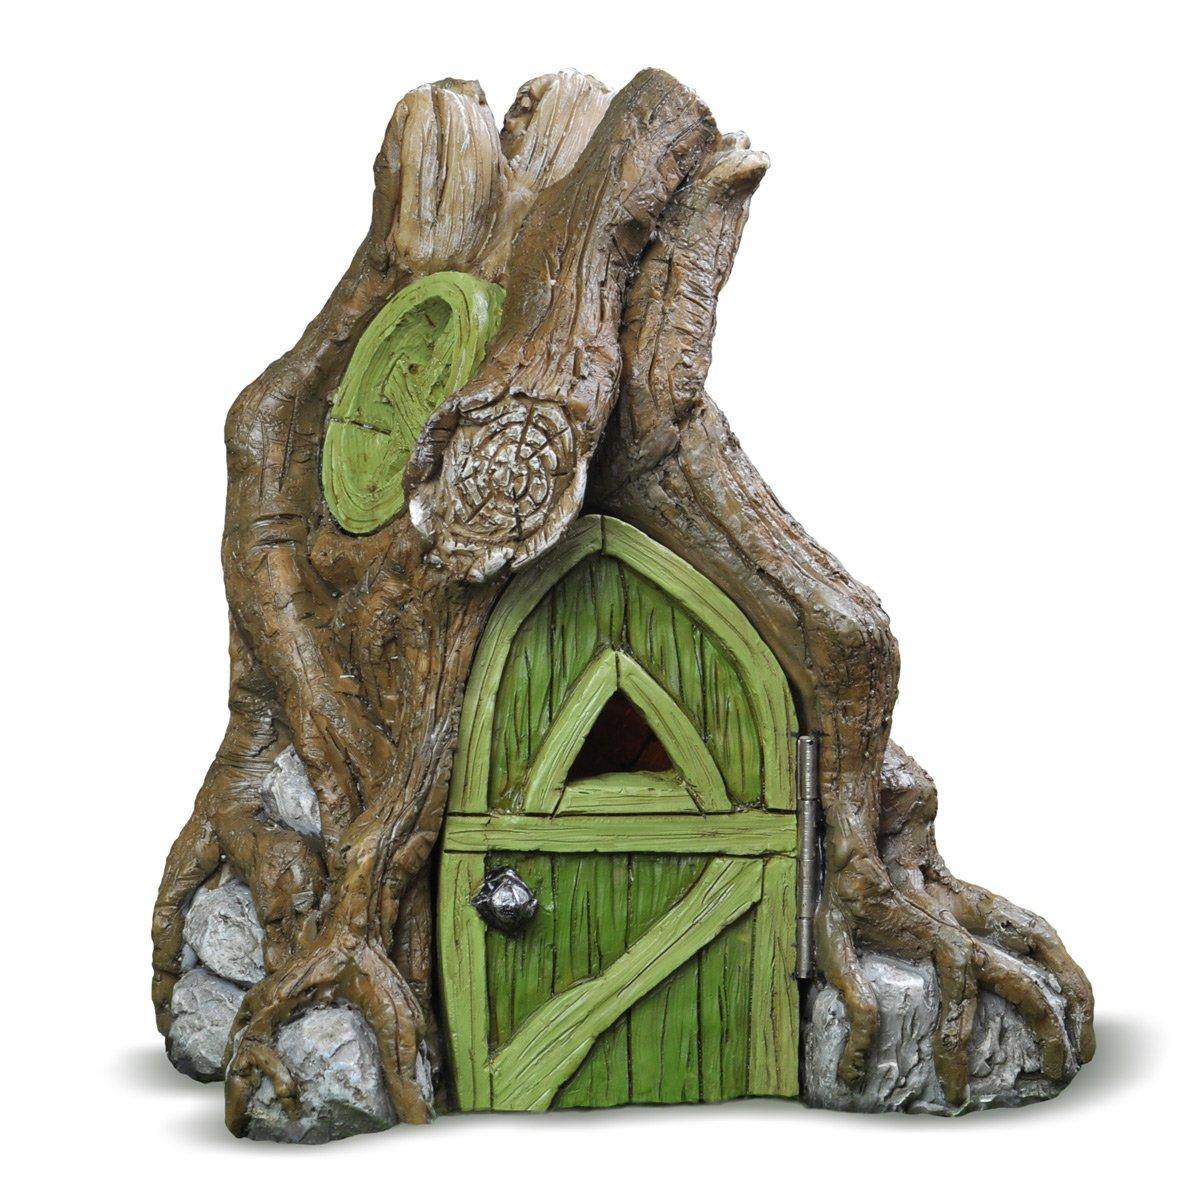 Georgetown Home Garden Miniature Fairy Root House Garden Decor ...